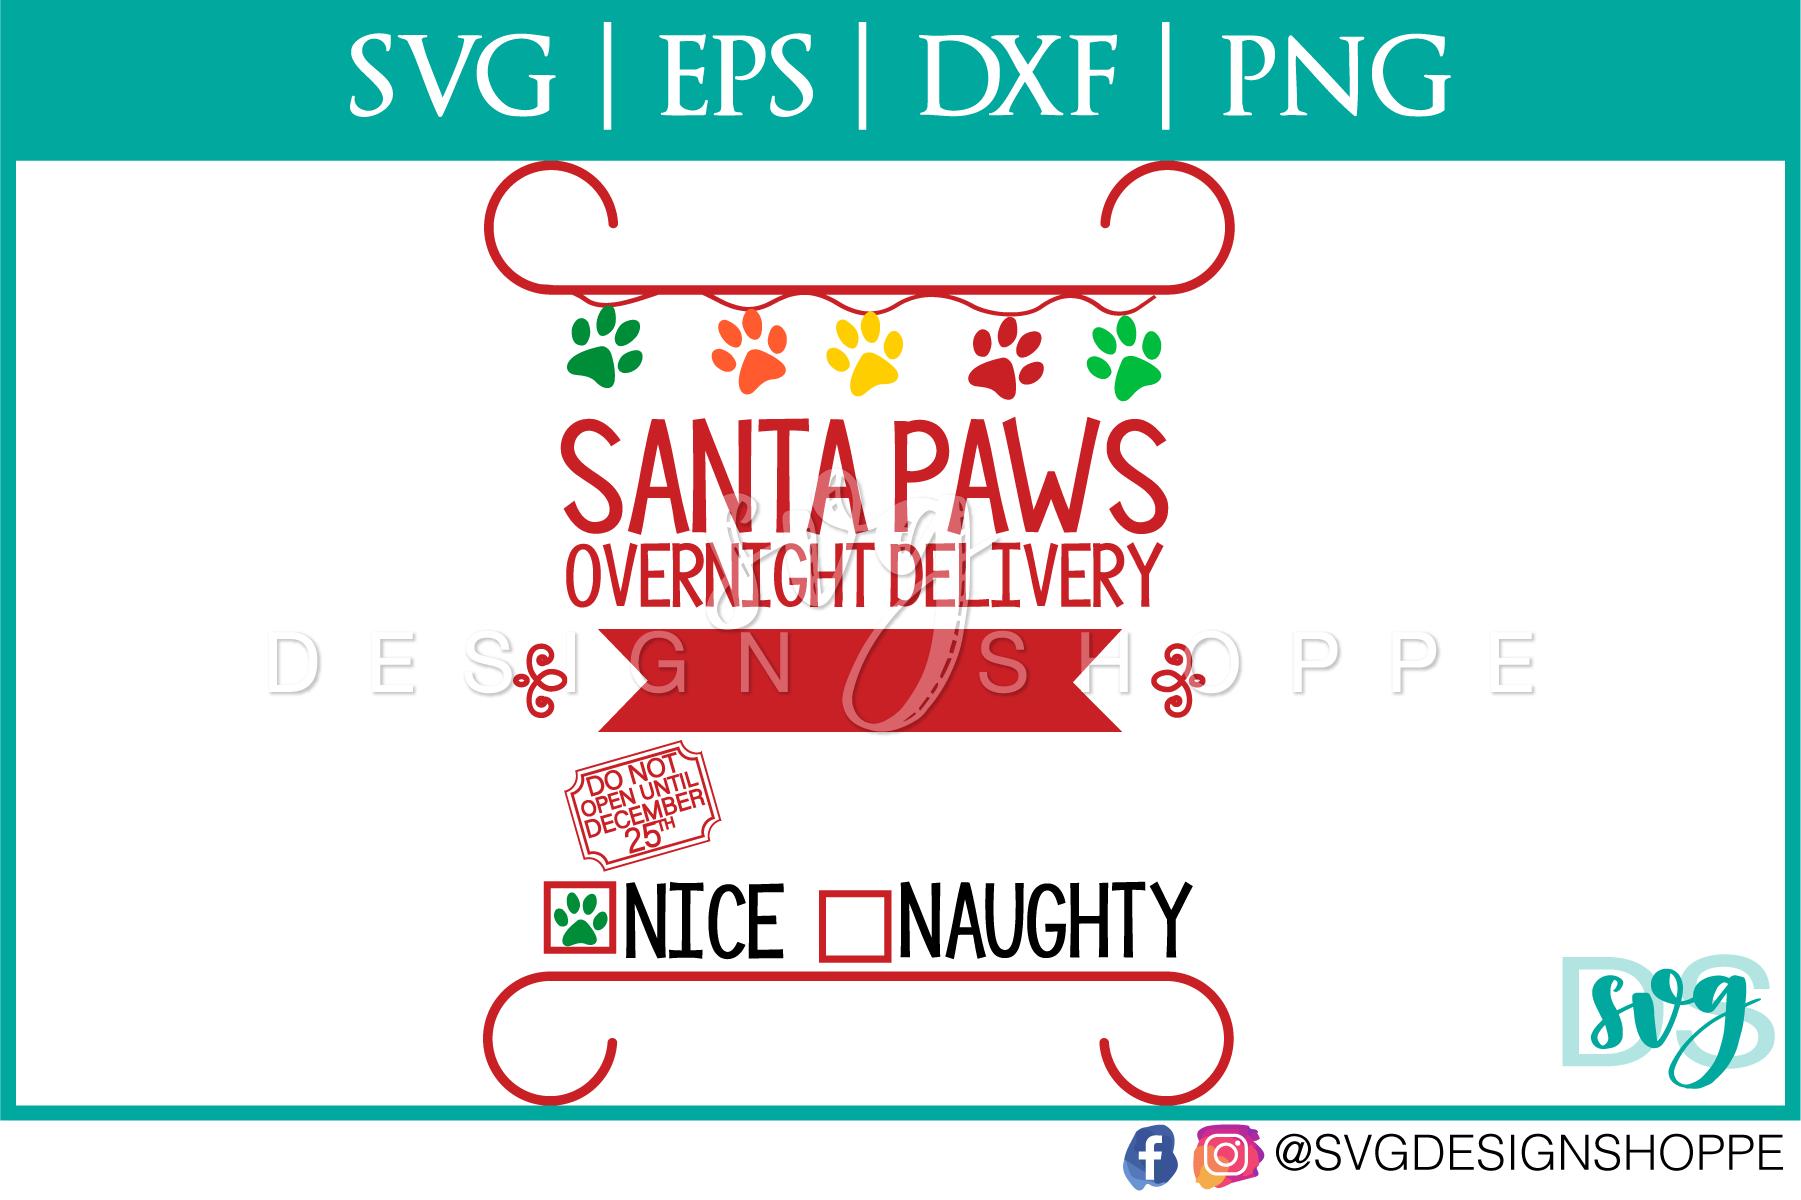 Santa Paws, SVG, Christmas, PNG, Cricut, Silhouette example image 2